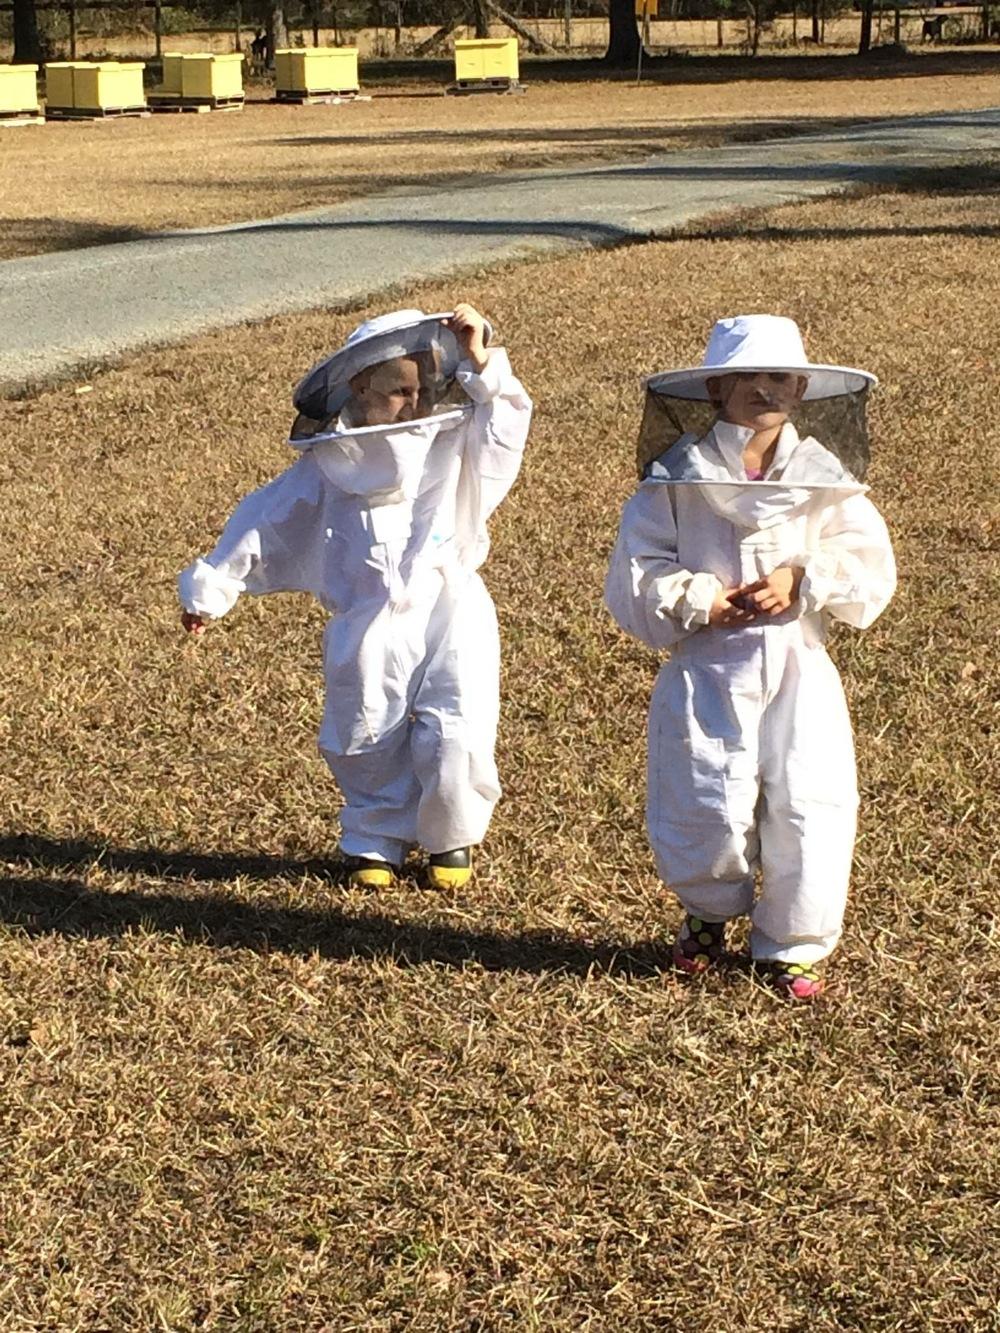 Beekeeper Services